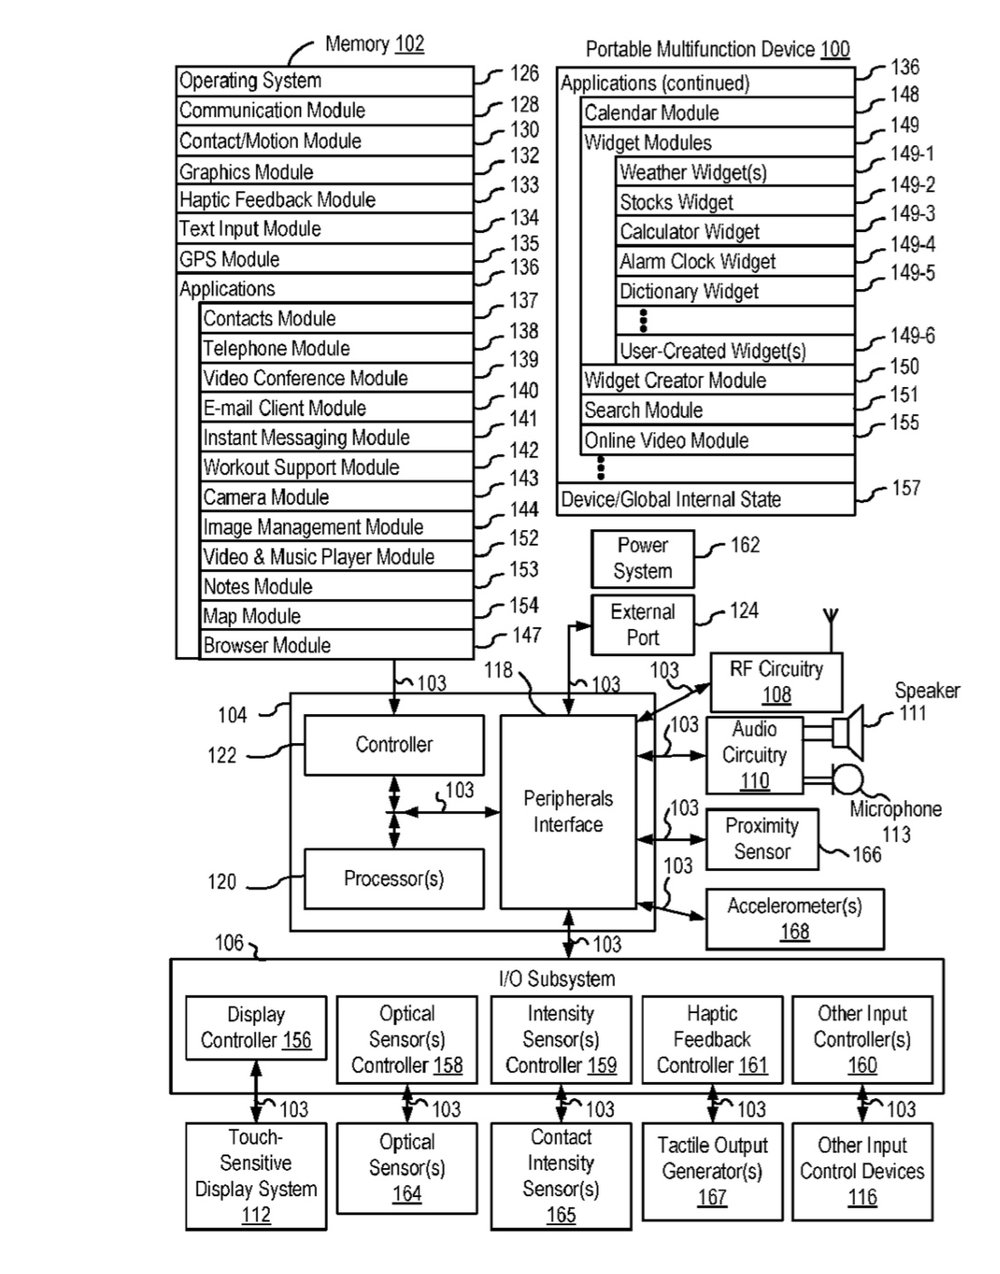 Phone calls patent.jpeg